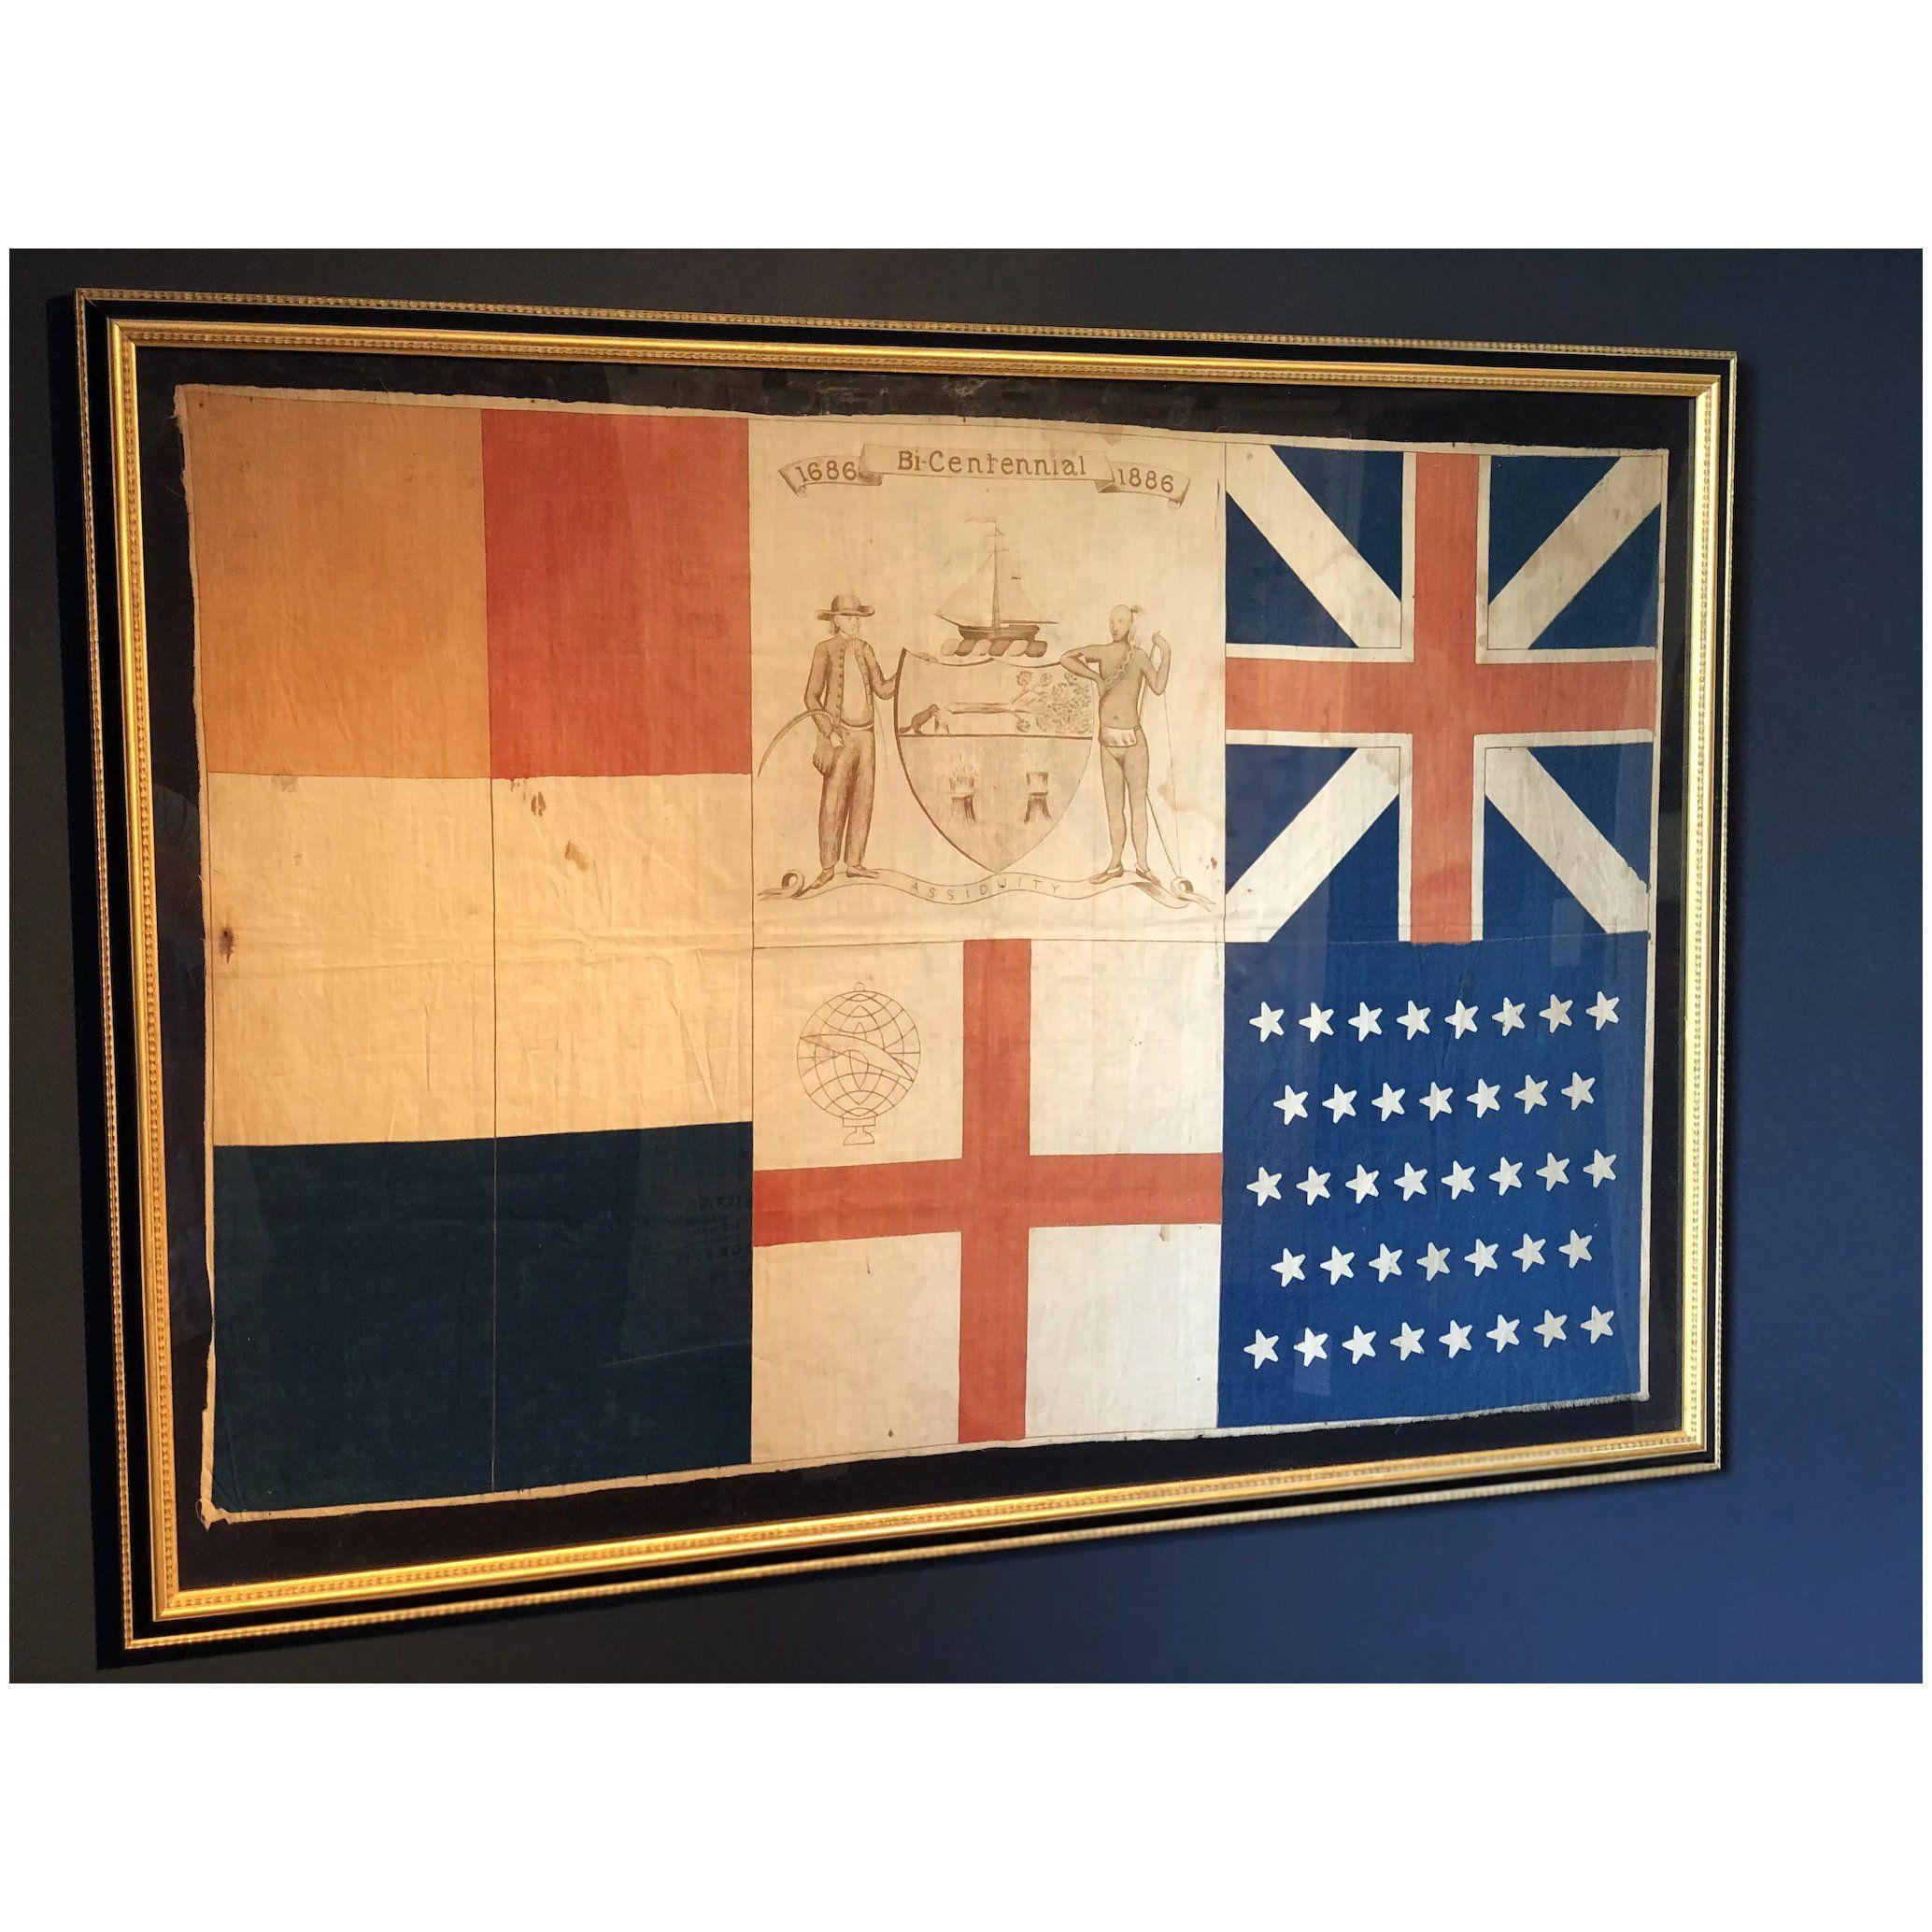 U S Albany Ny New York Bicentennial Flag 1686 1886 Cotton Muslin Historic Antique Flag Professionally Framed Memorabi In 2020 Muslin Cotton Antiques England Flag